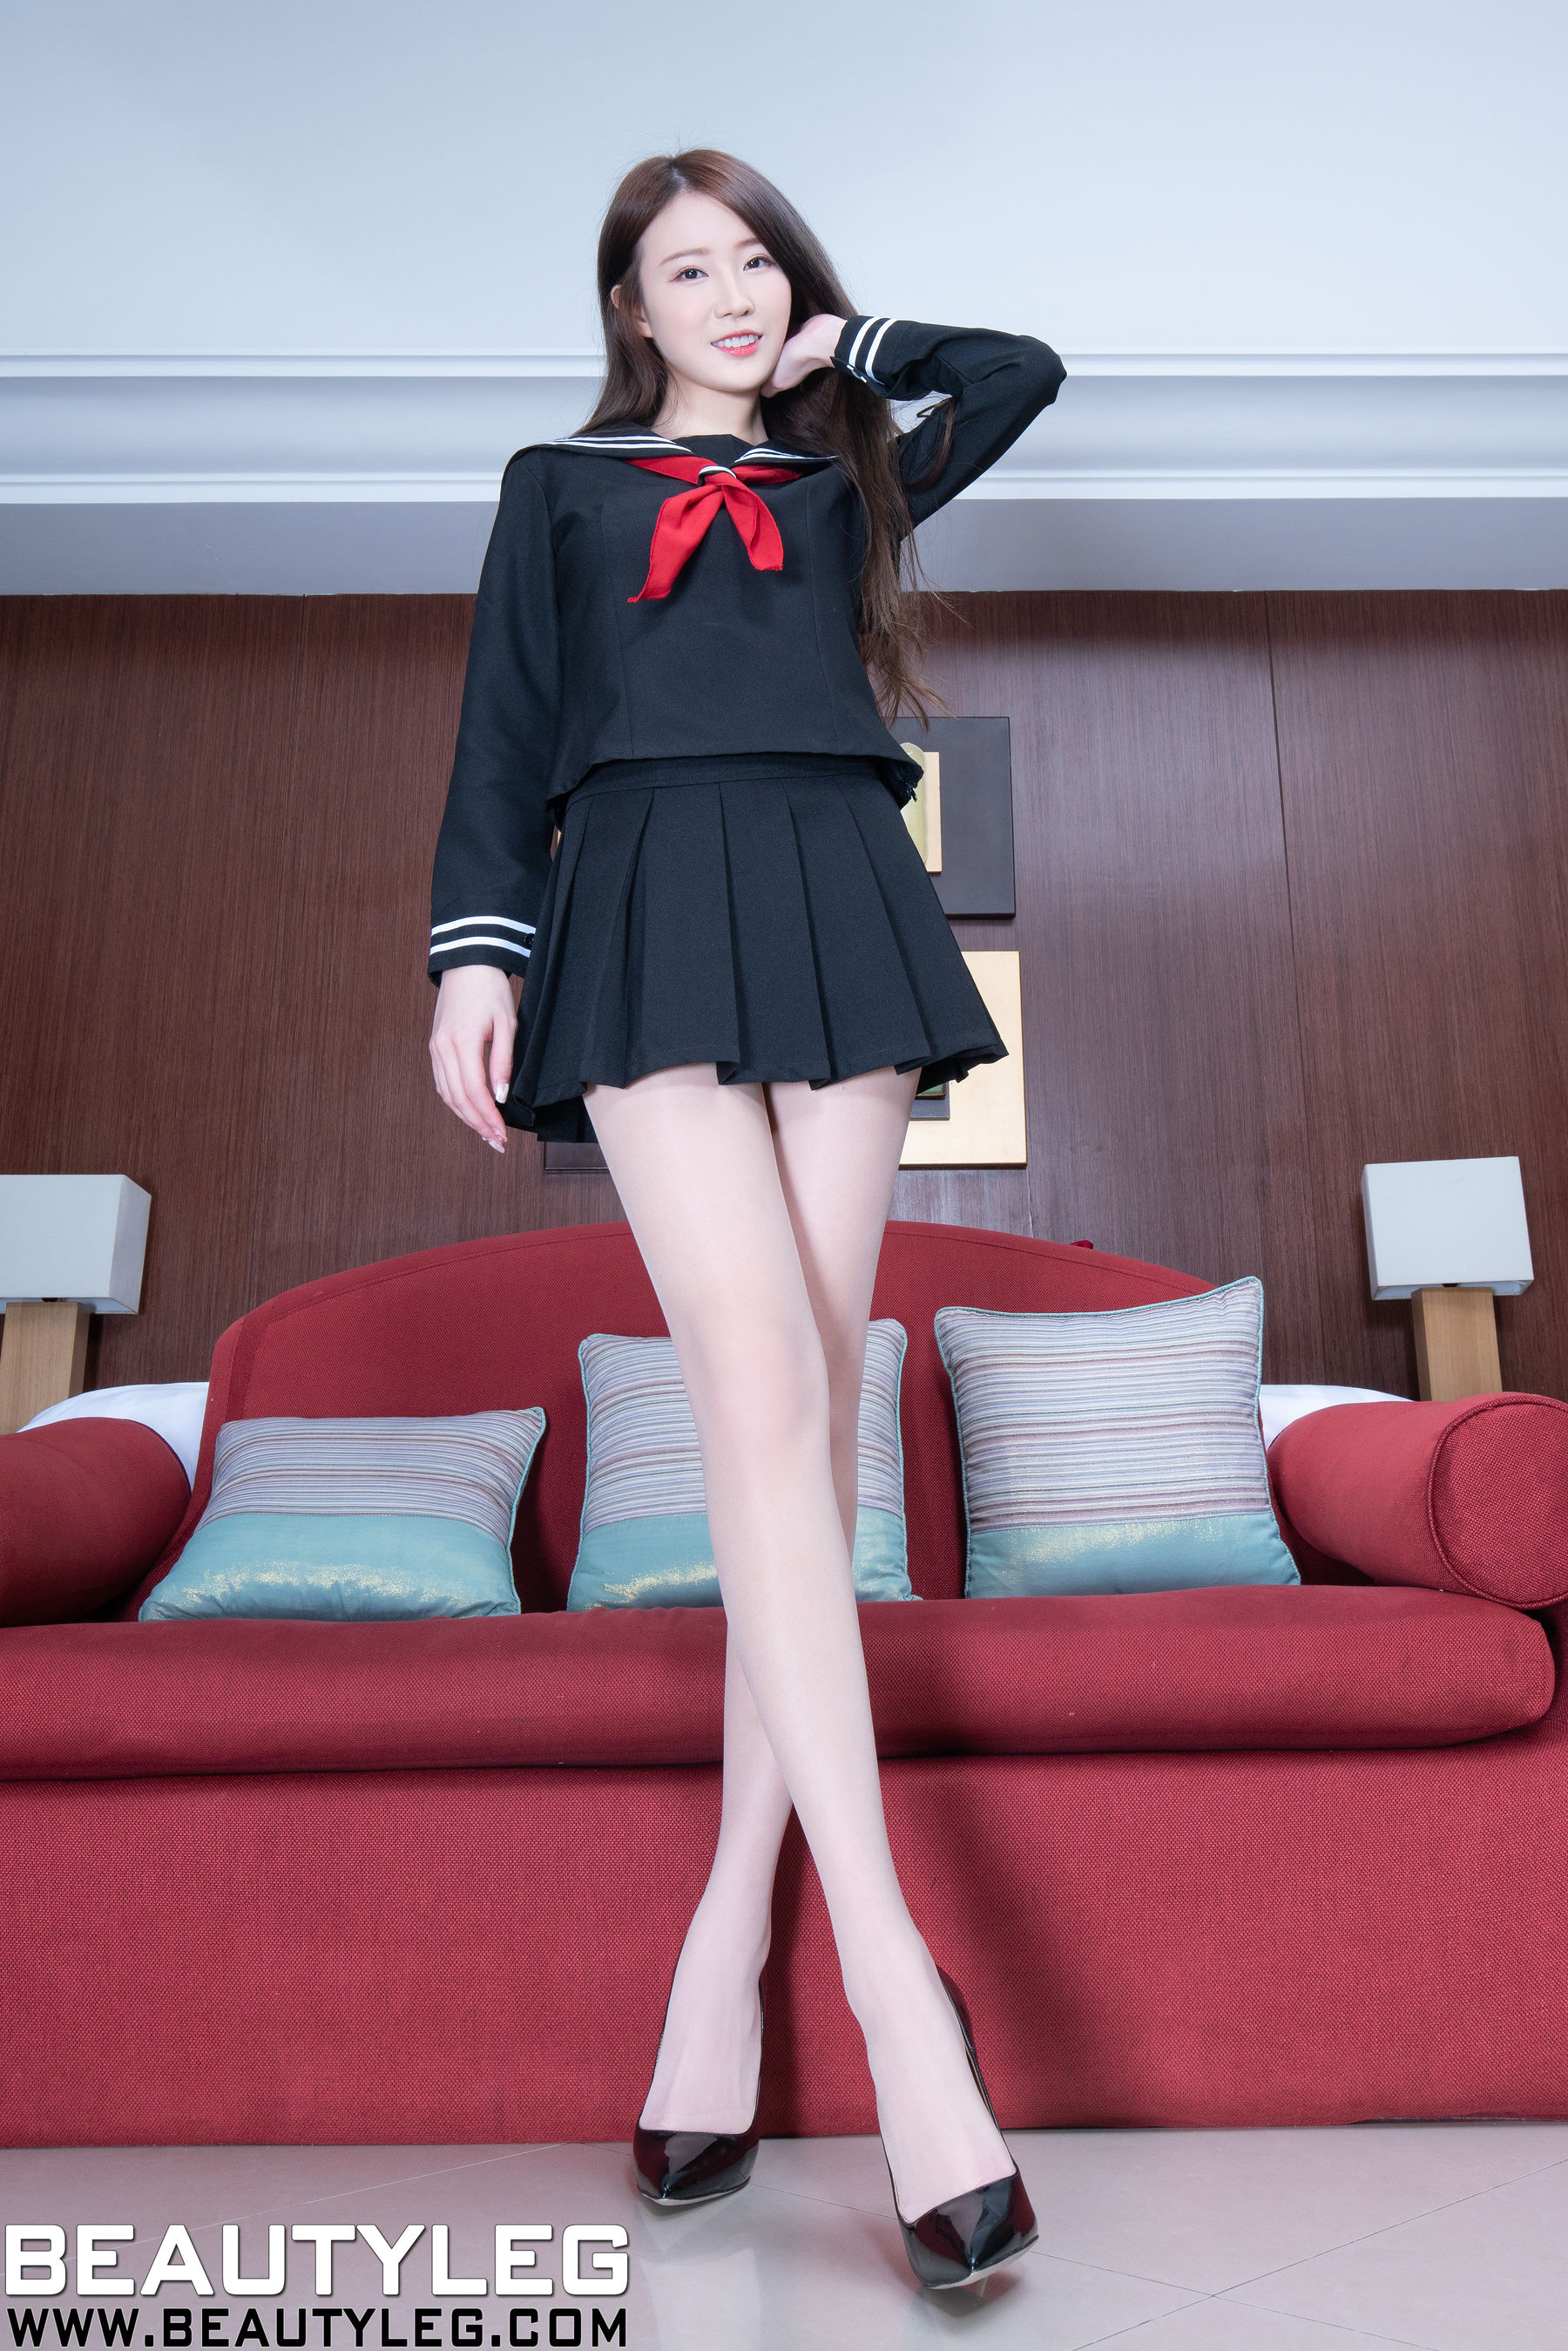 VOL.1407 [Beautyleg]超短裙制服美腿:杨思原(腿模Lia,Lia杨思原)超高清个人性感漂亮大图(43P)